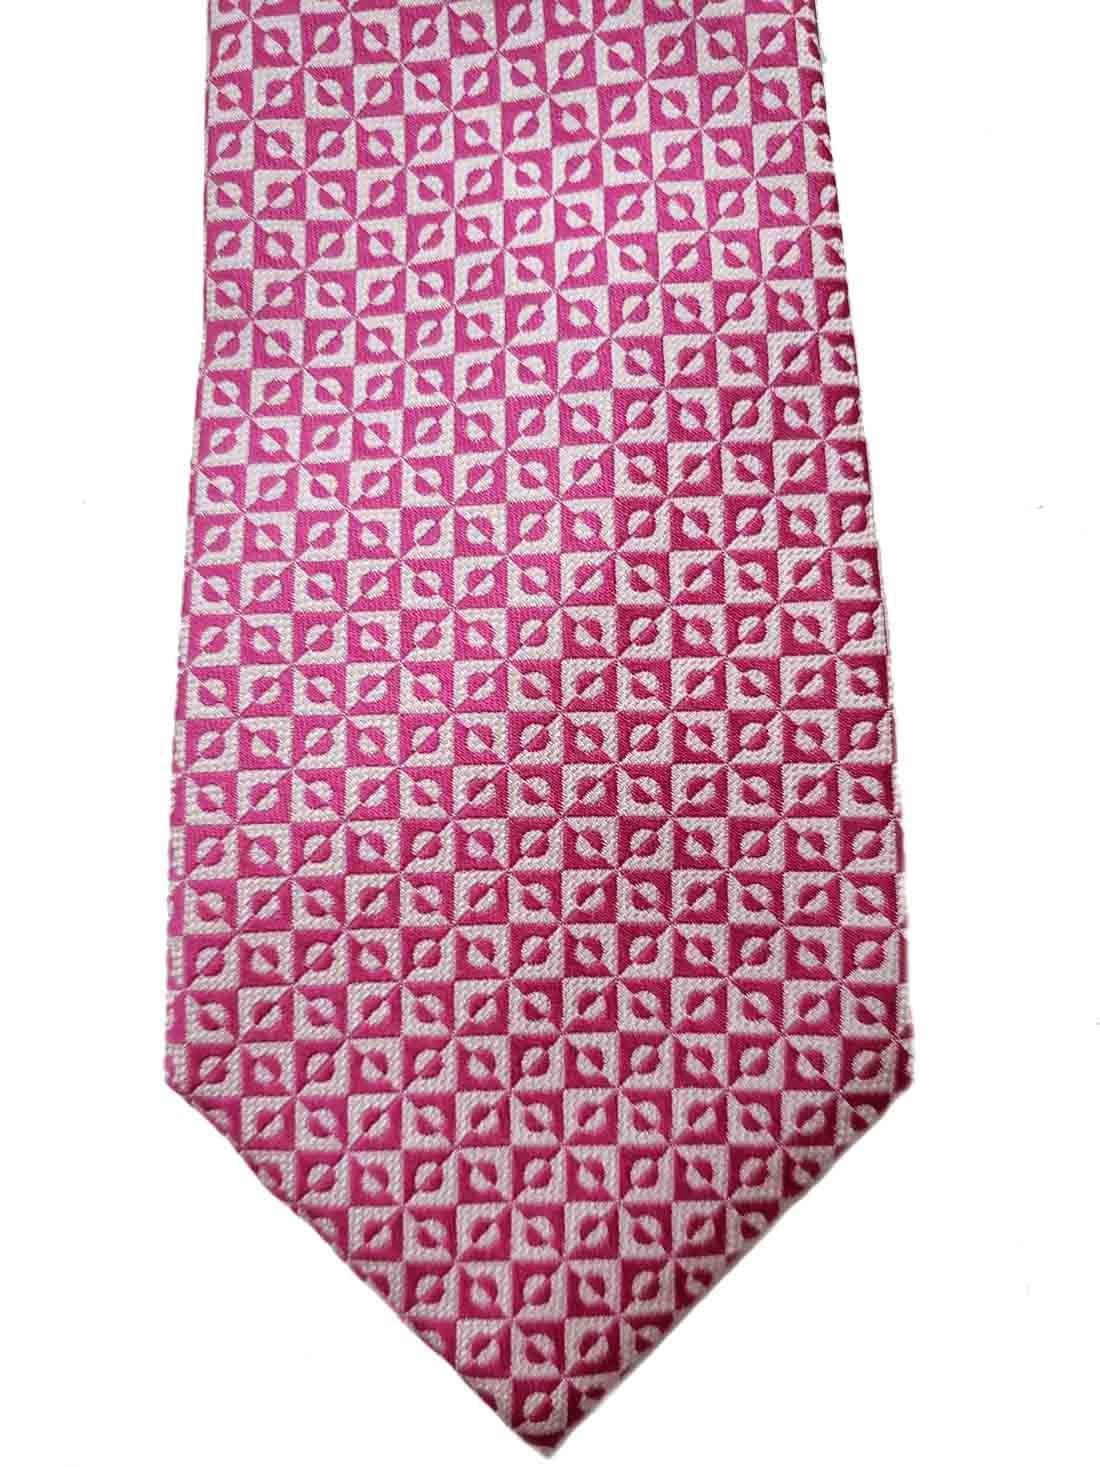 Ralph Lauren Silk Tie Pink White Geometric Hand Made Men's